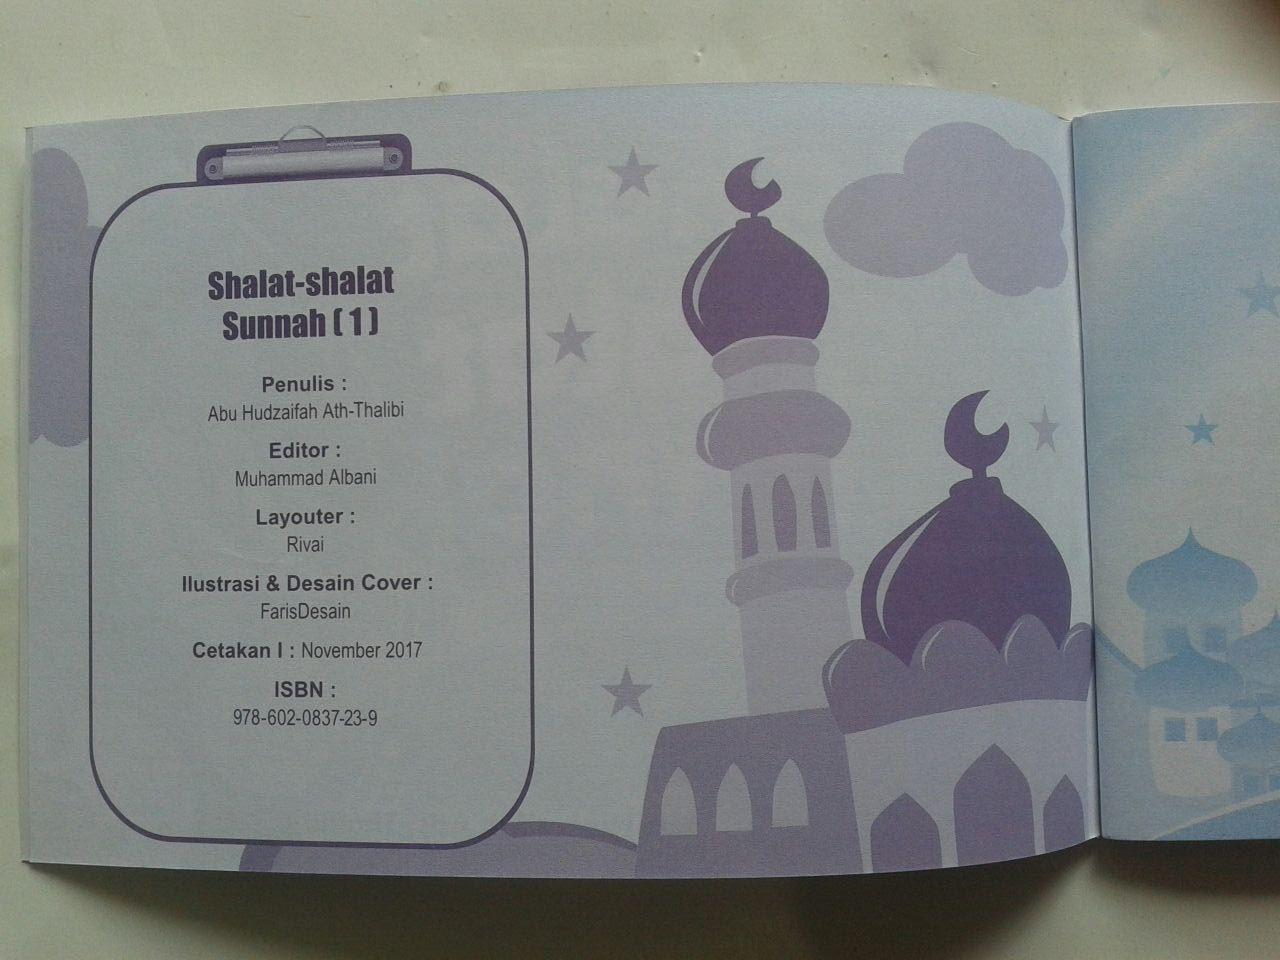 Buku Anak Shalat Shalat Sunnah Sesuai Tuntunan Nabi 1 isi 2